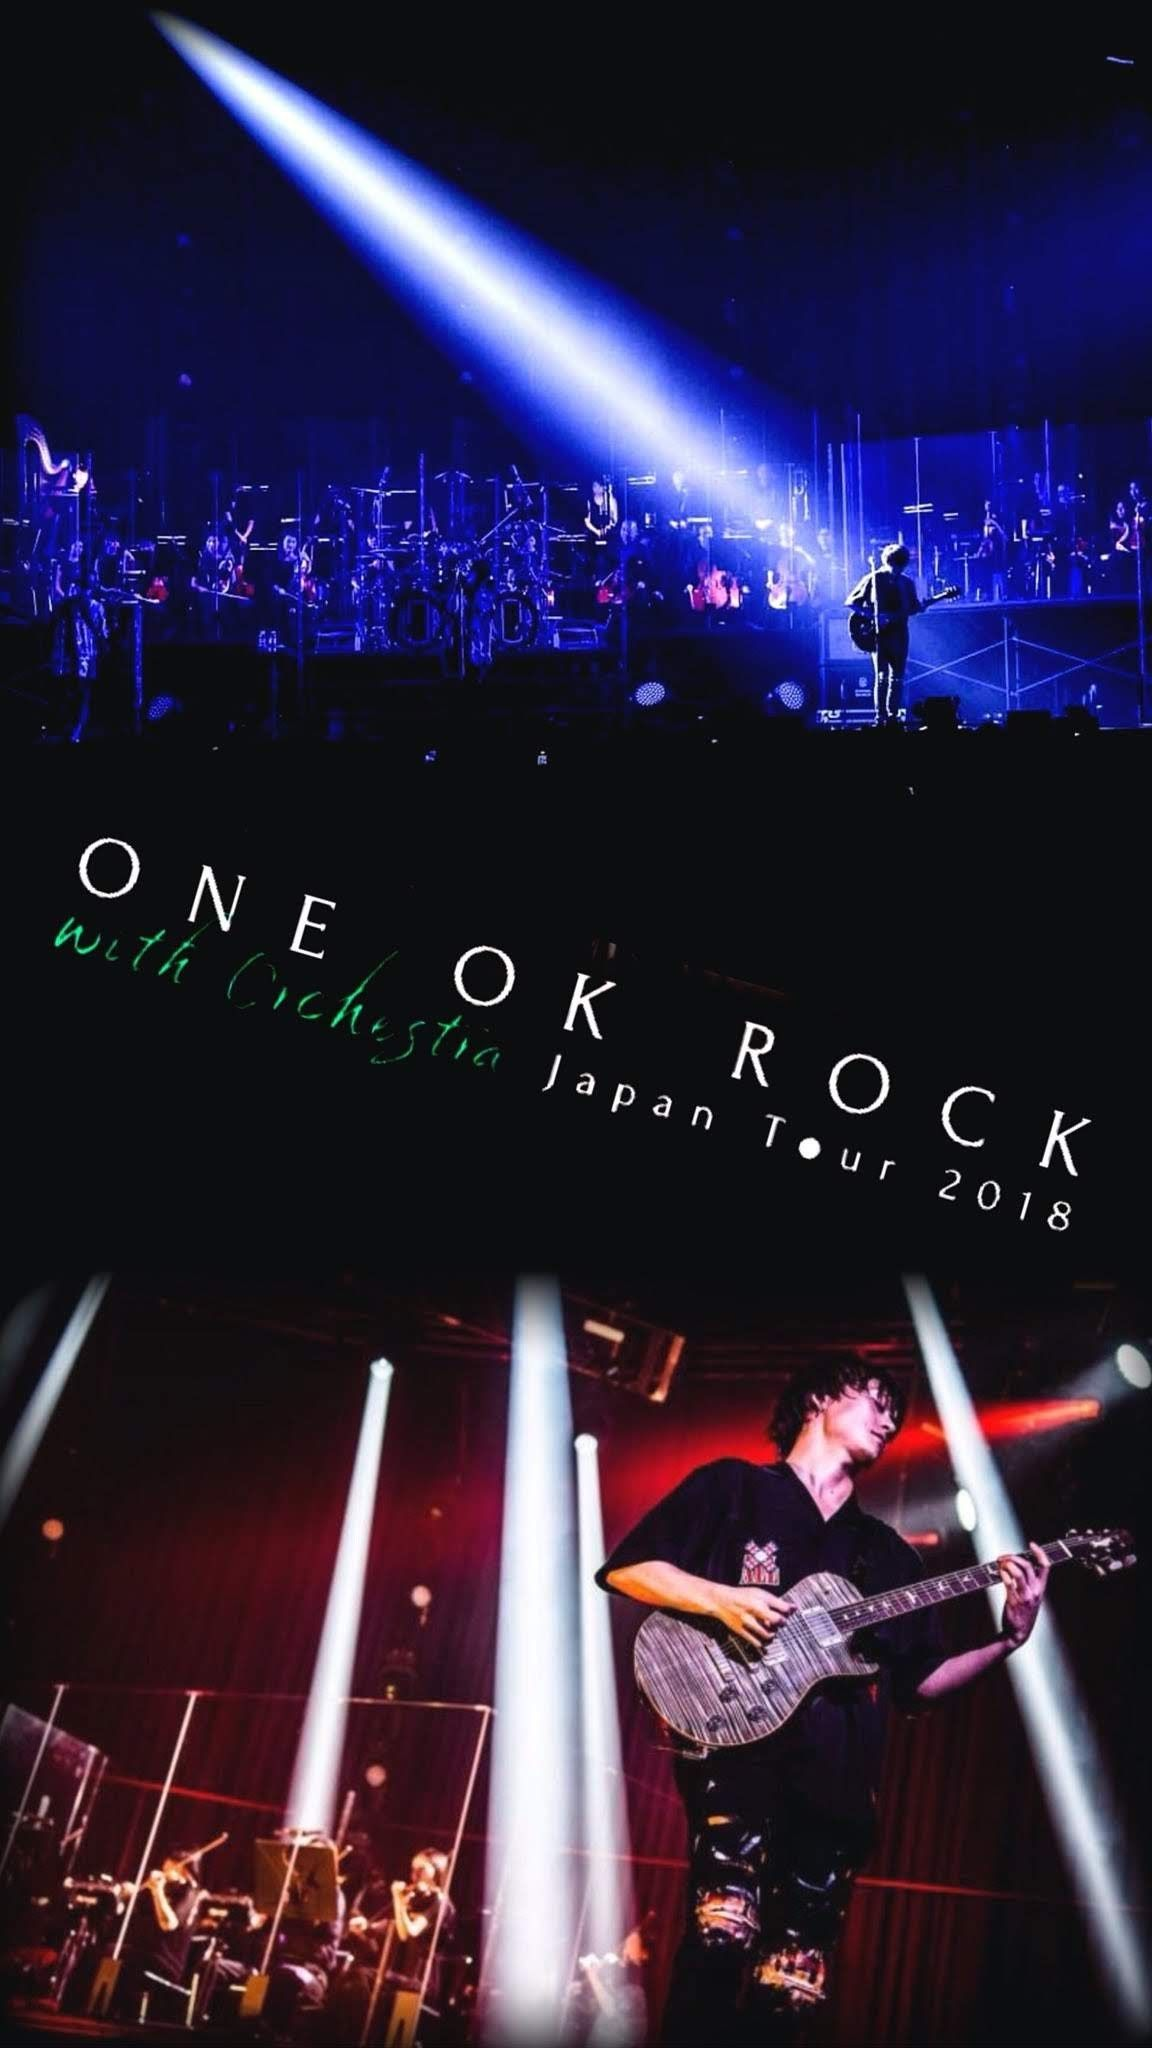 One Ok Rock おしゃれまとめの人気アイデア Pinterest Ayarivowob ワンオク 壁紙 ワンオクロック Toru ワンオク